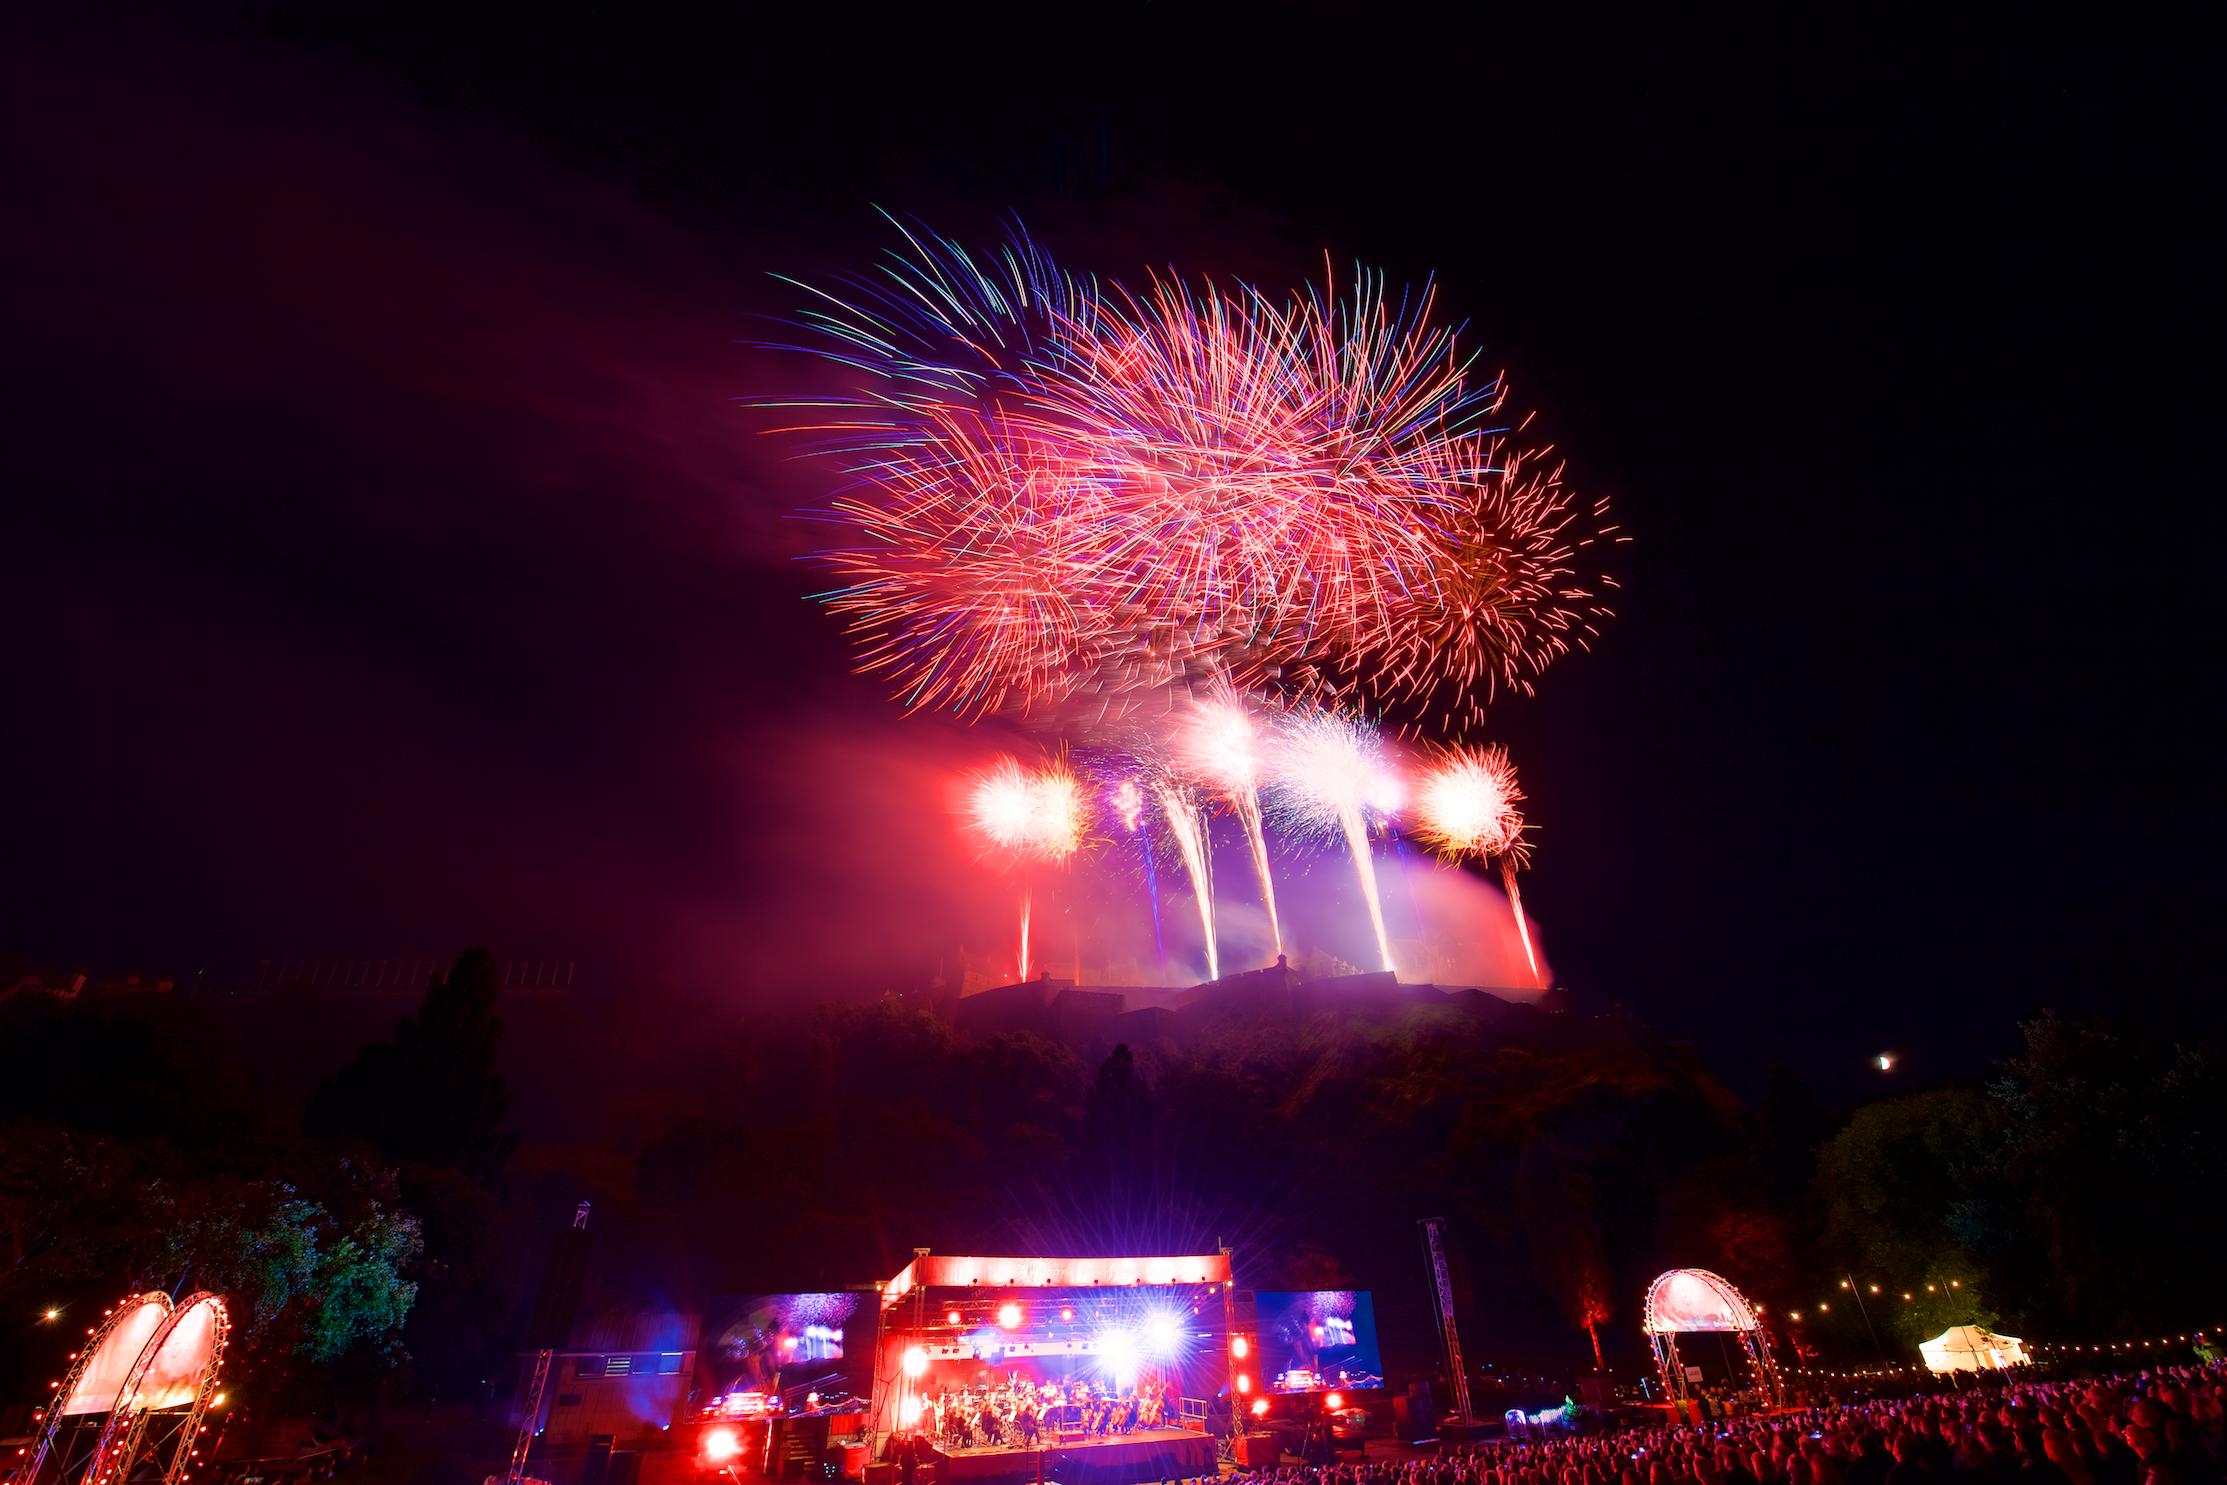 grand-finale-of-the-2017-international-festival-virgin-money-fireworks-concert-ross-bandstand-princes-street-gardens-edinburgh-uk-monday-28th-august-2017-3